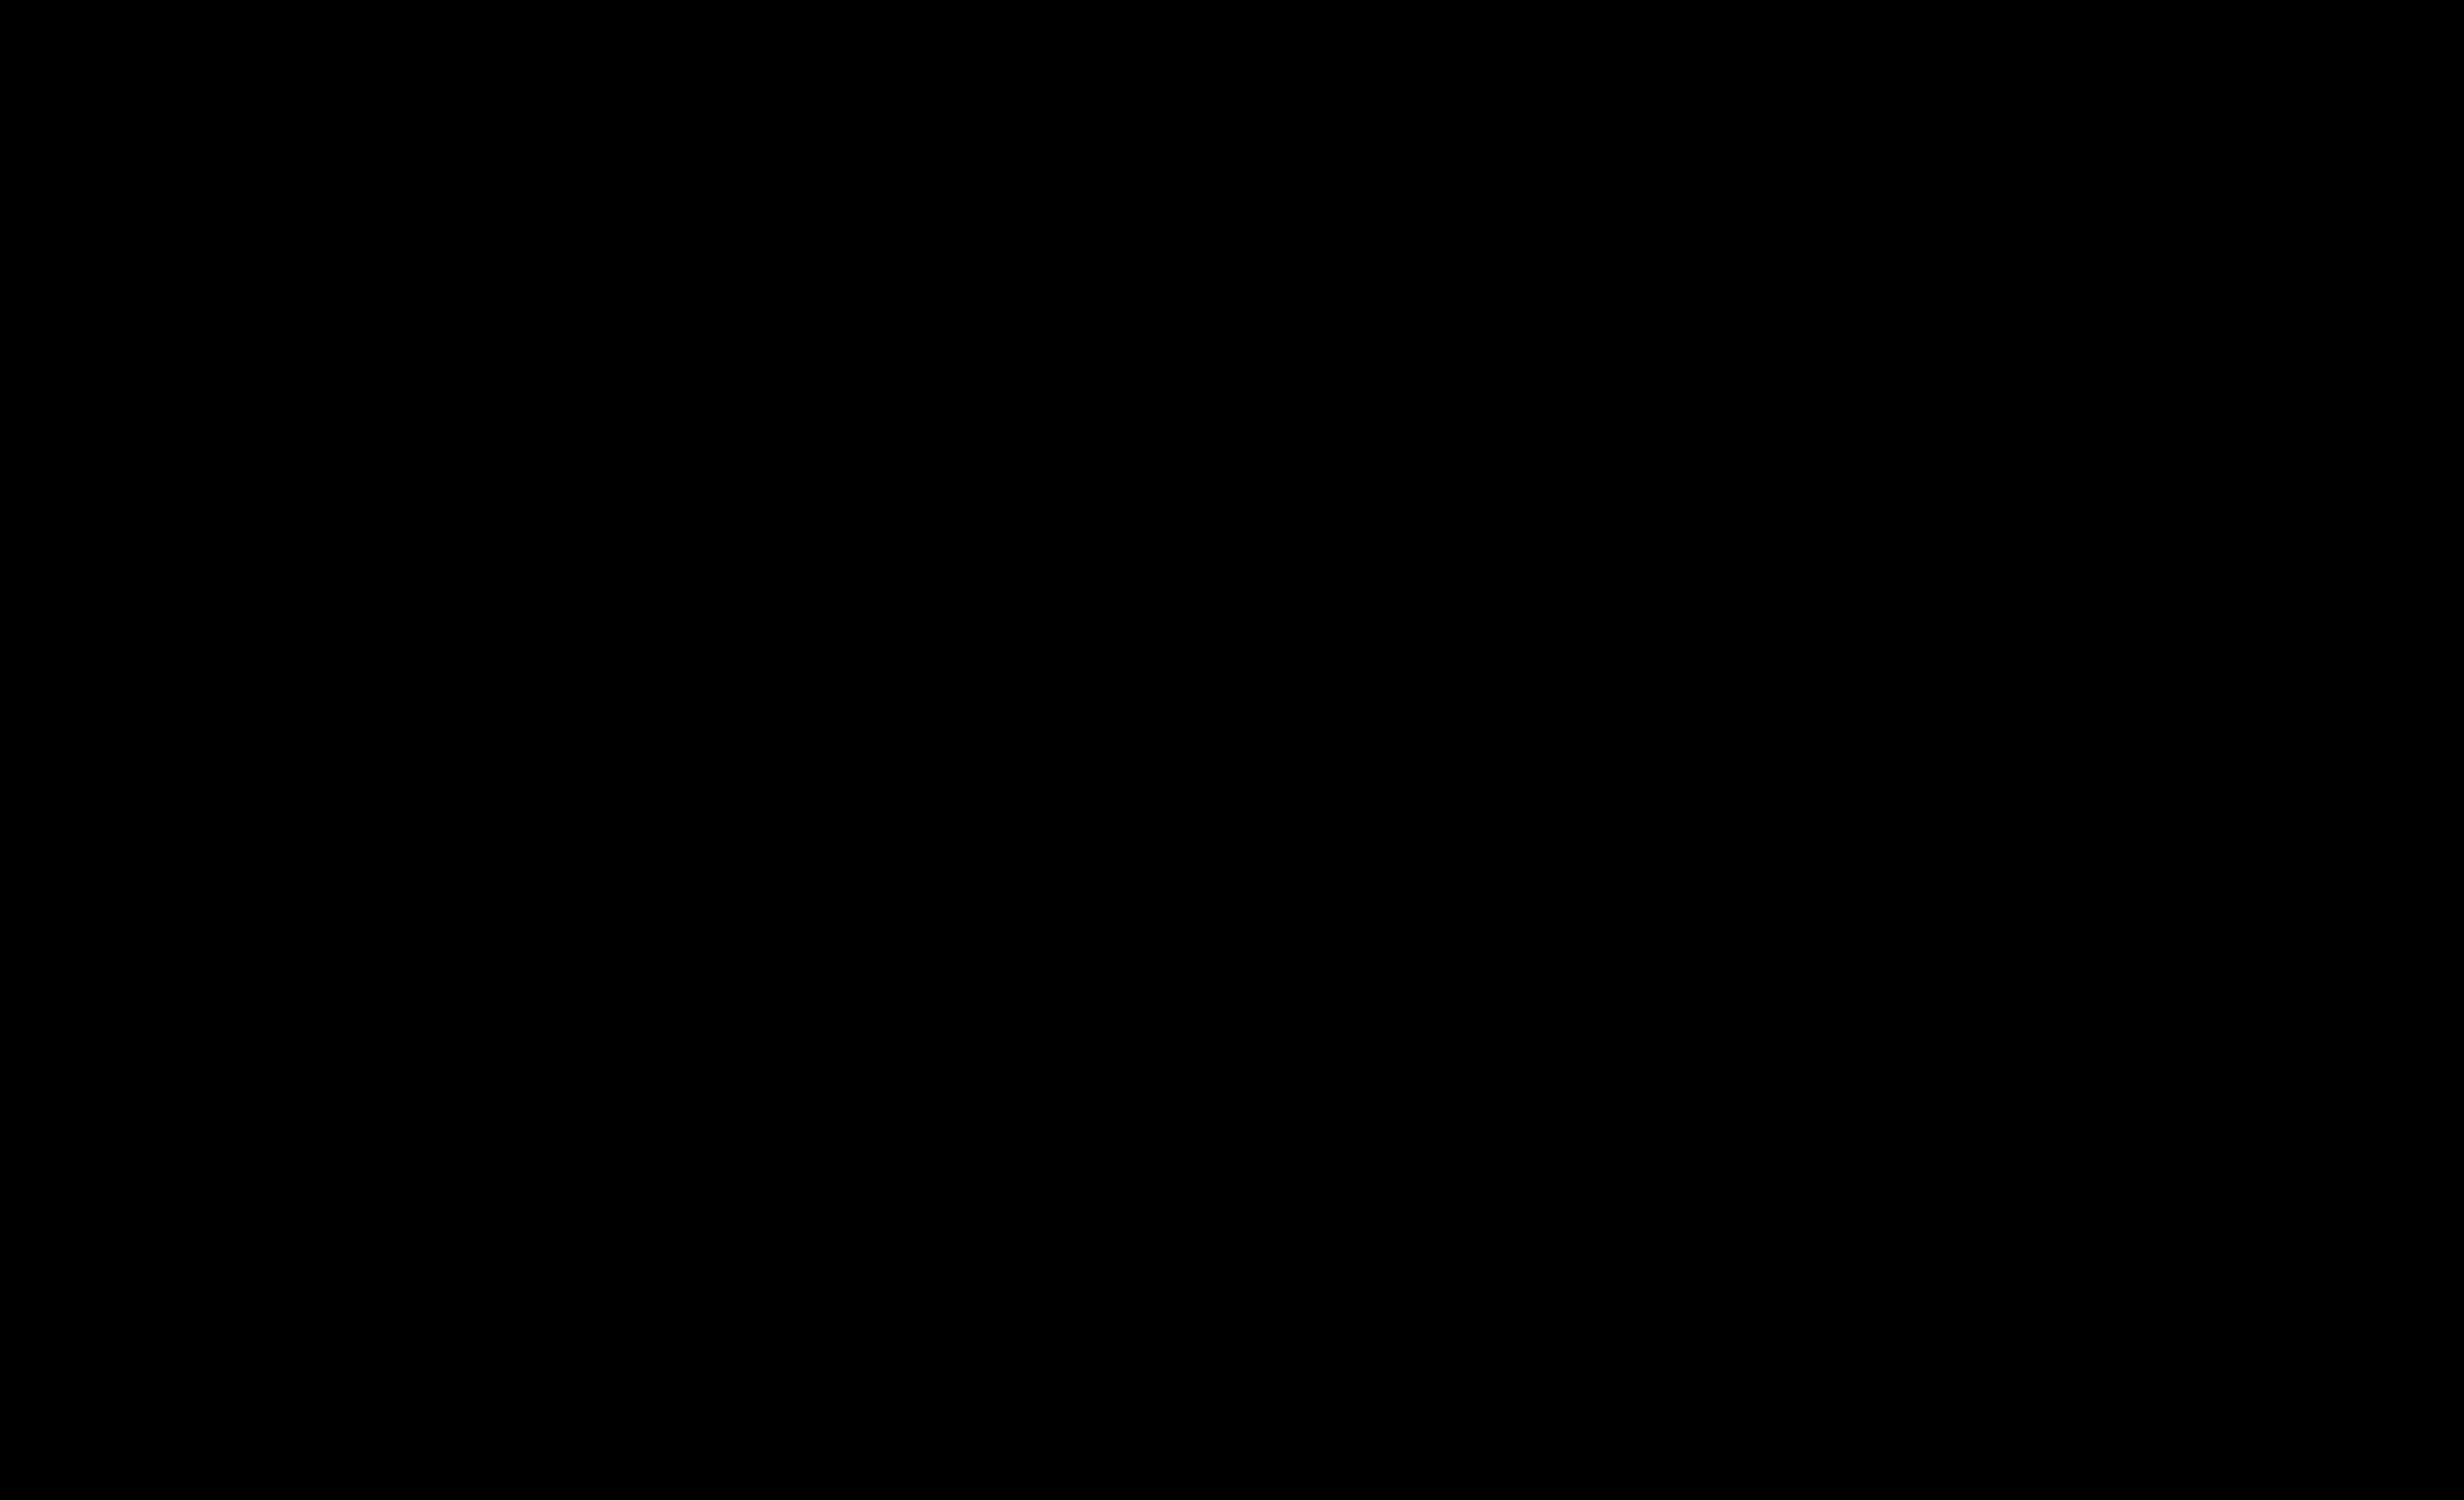 UBE_Uber_Logo_Black_CMYK.png